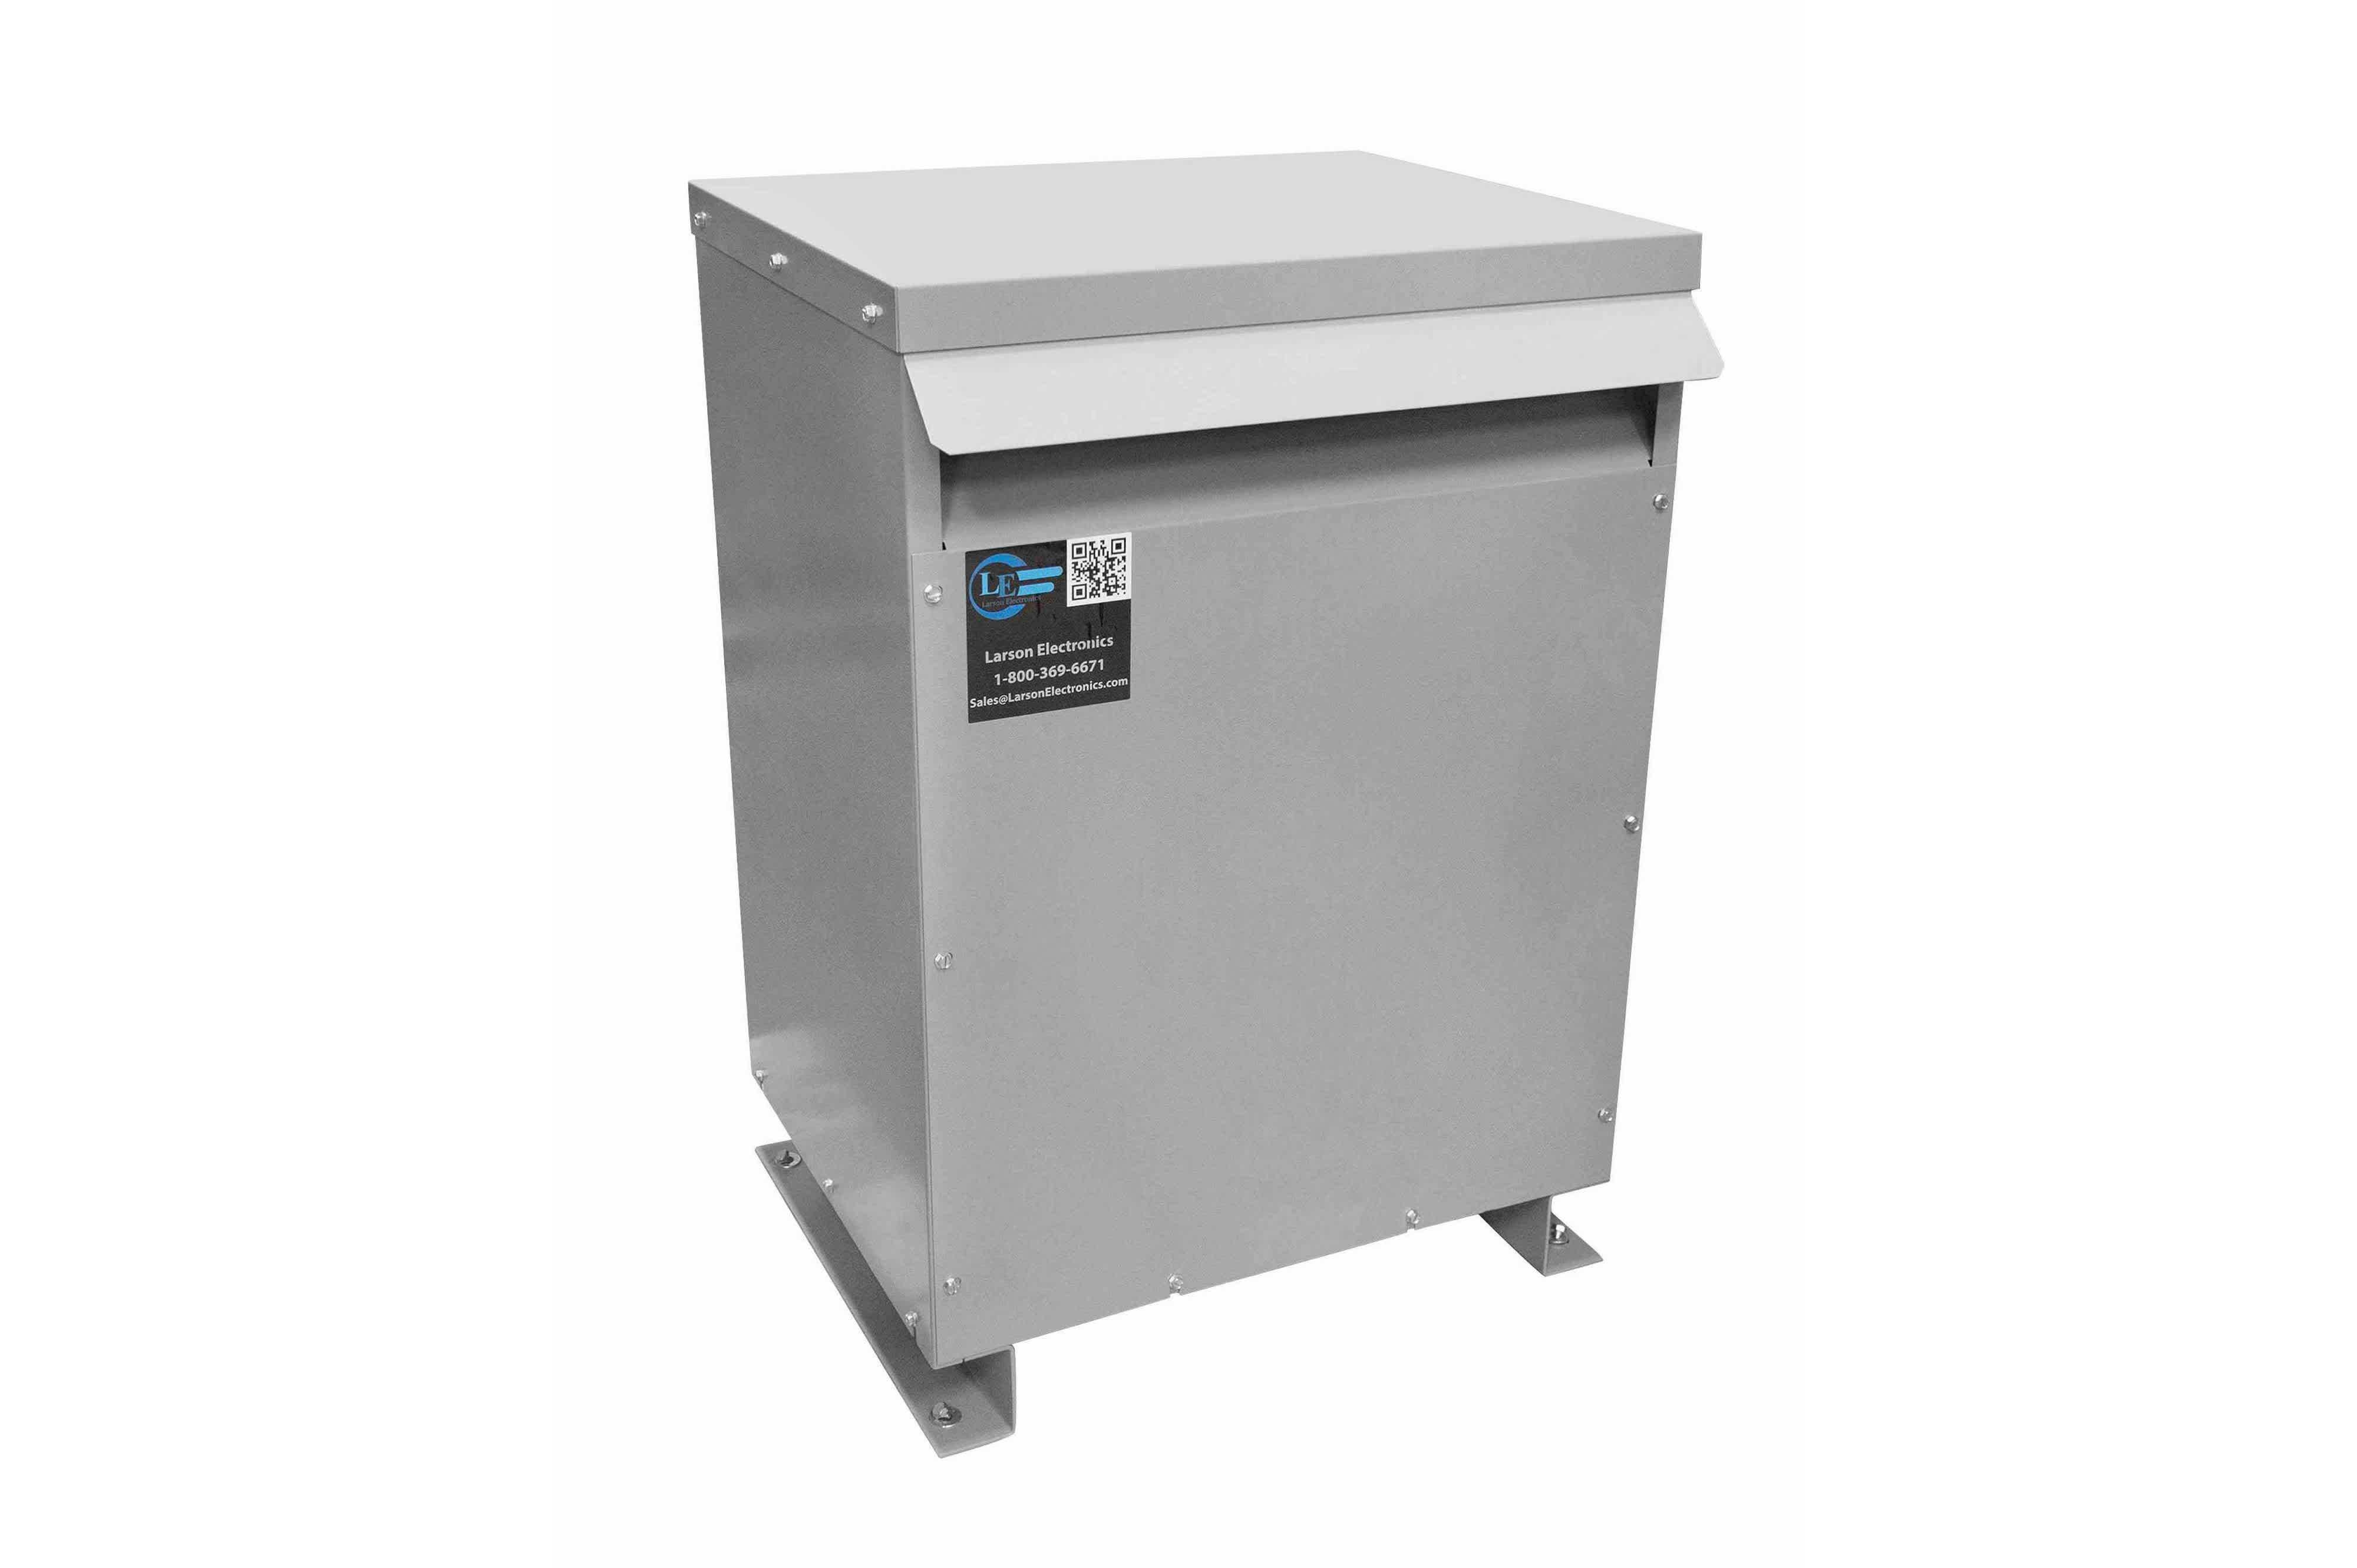 100 kVA 3PH Isolation Transformer, 230V Wye Primary, 480V Delta Secondary, N3R, Ventilated, 60 Hz